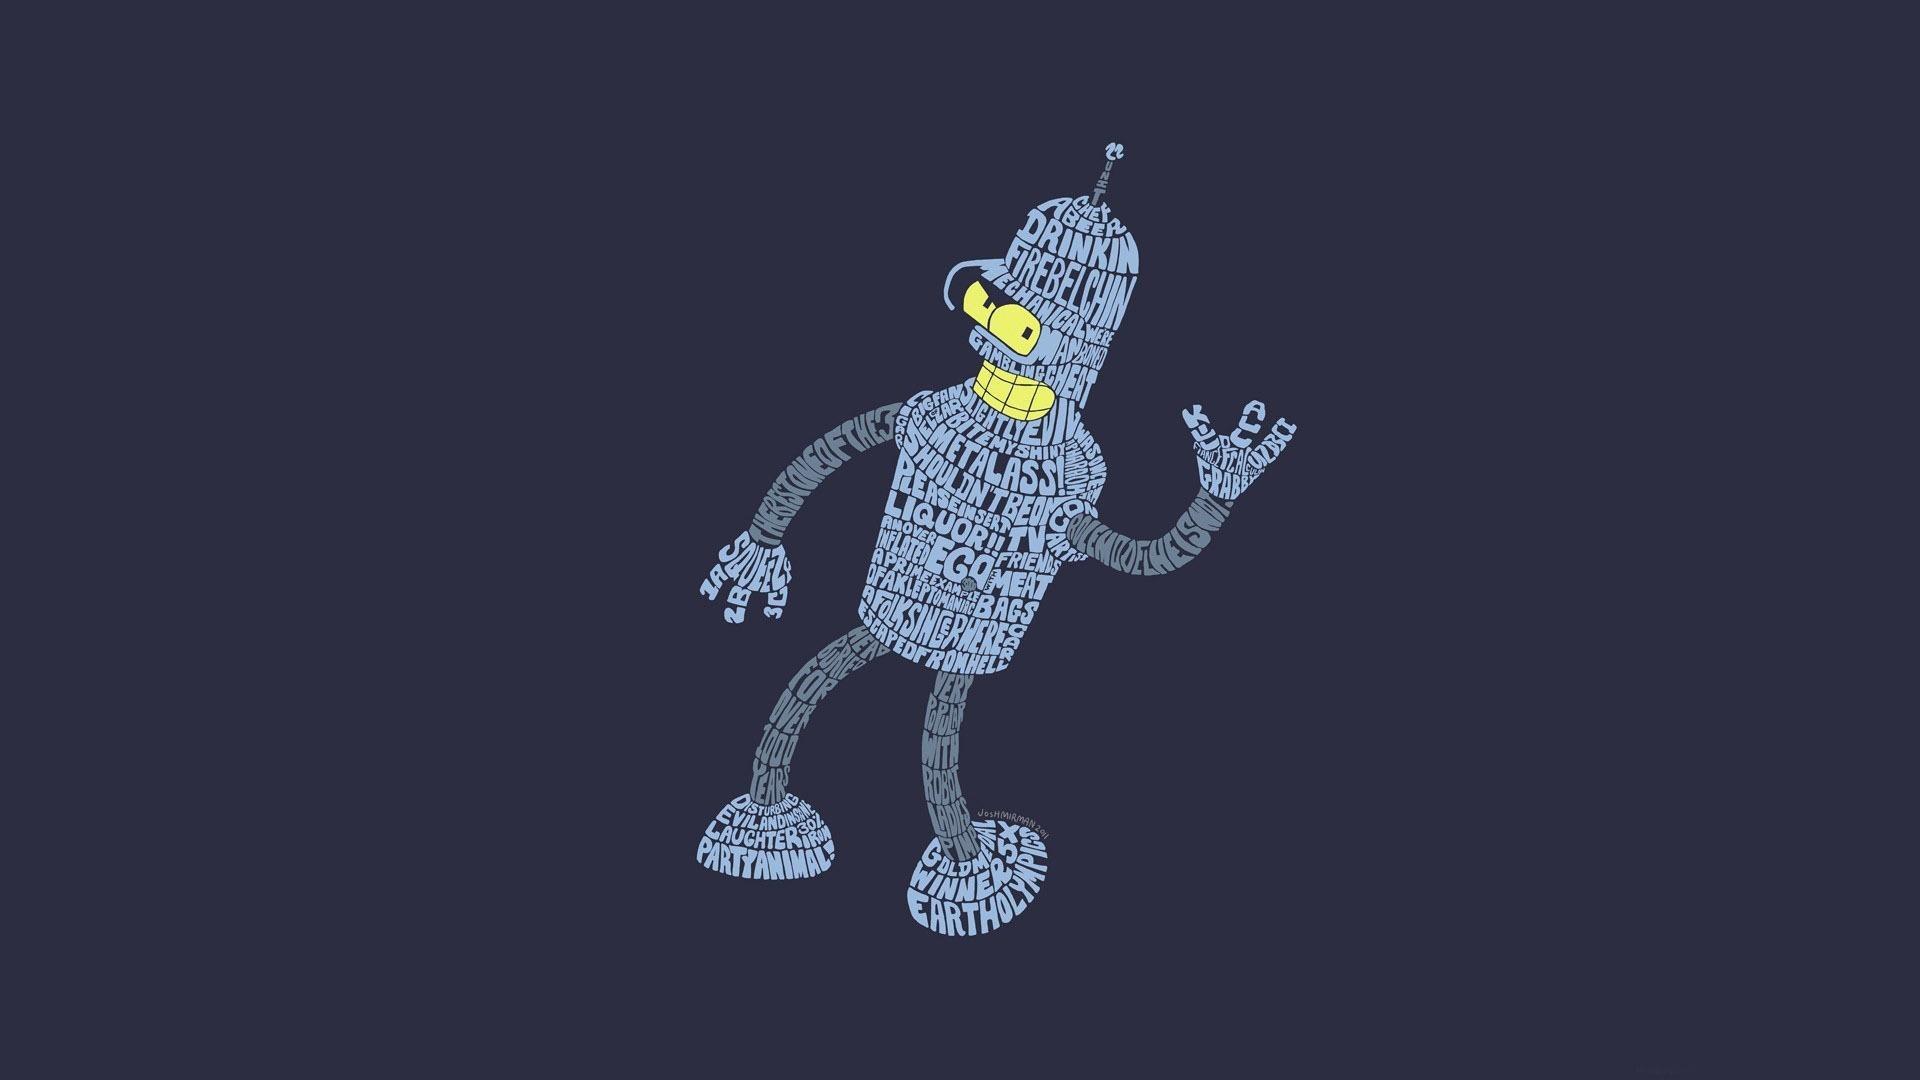 Res: 1920x1080, Cartoon Wallpapers. Download the following Futurama Desktop ...